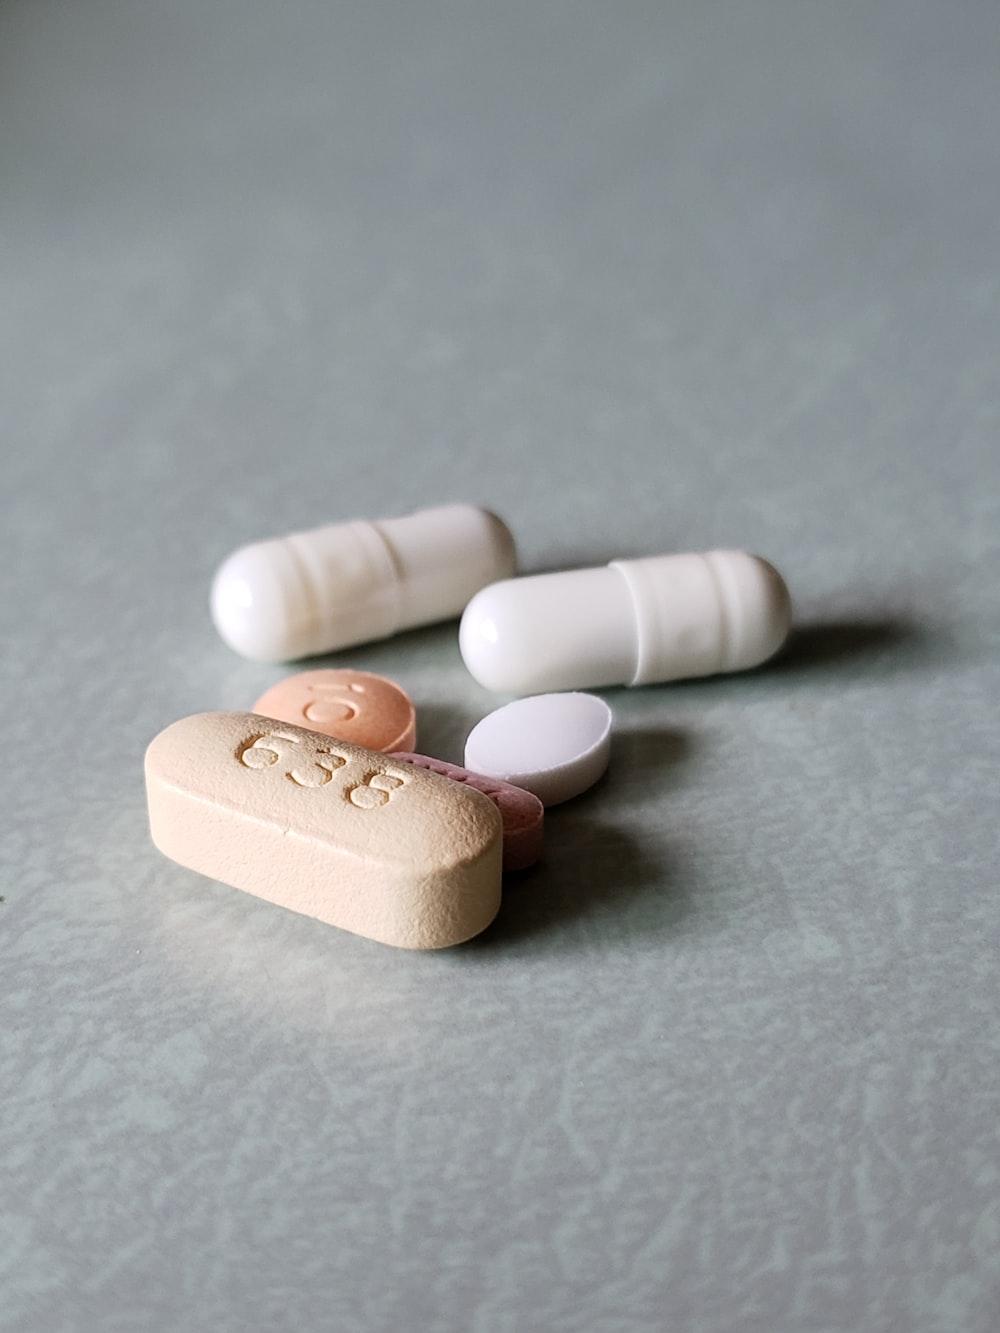 white medication pill on gray textile